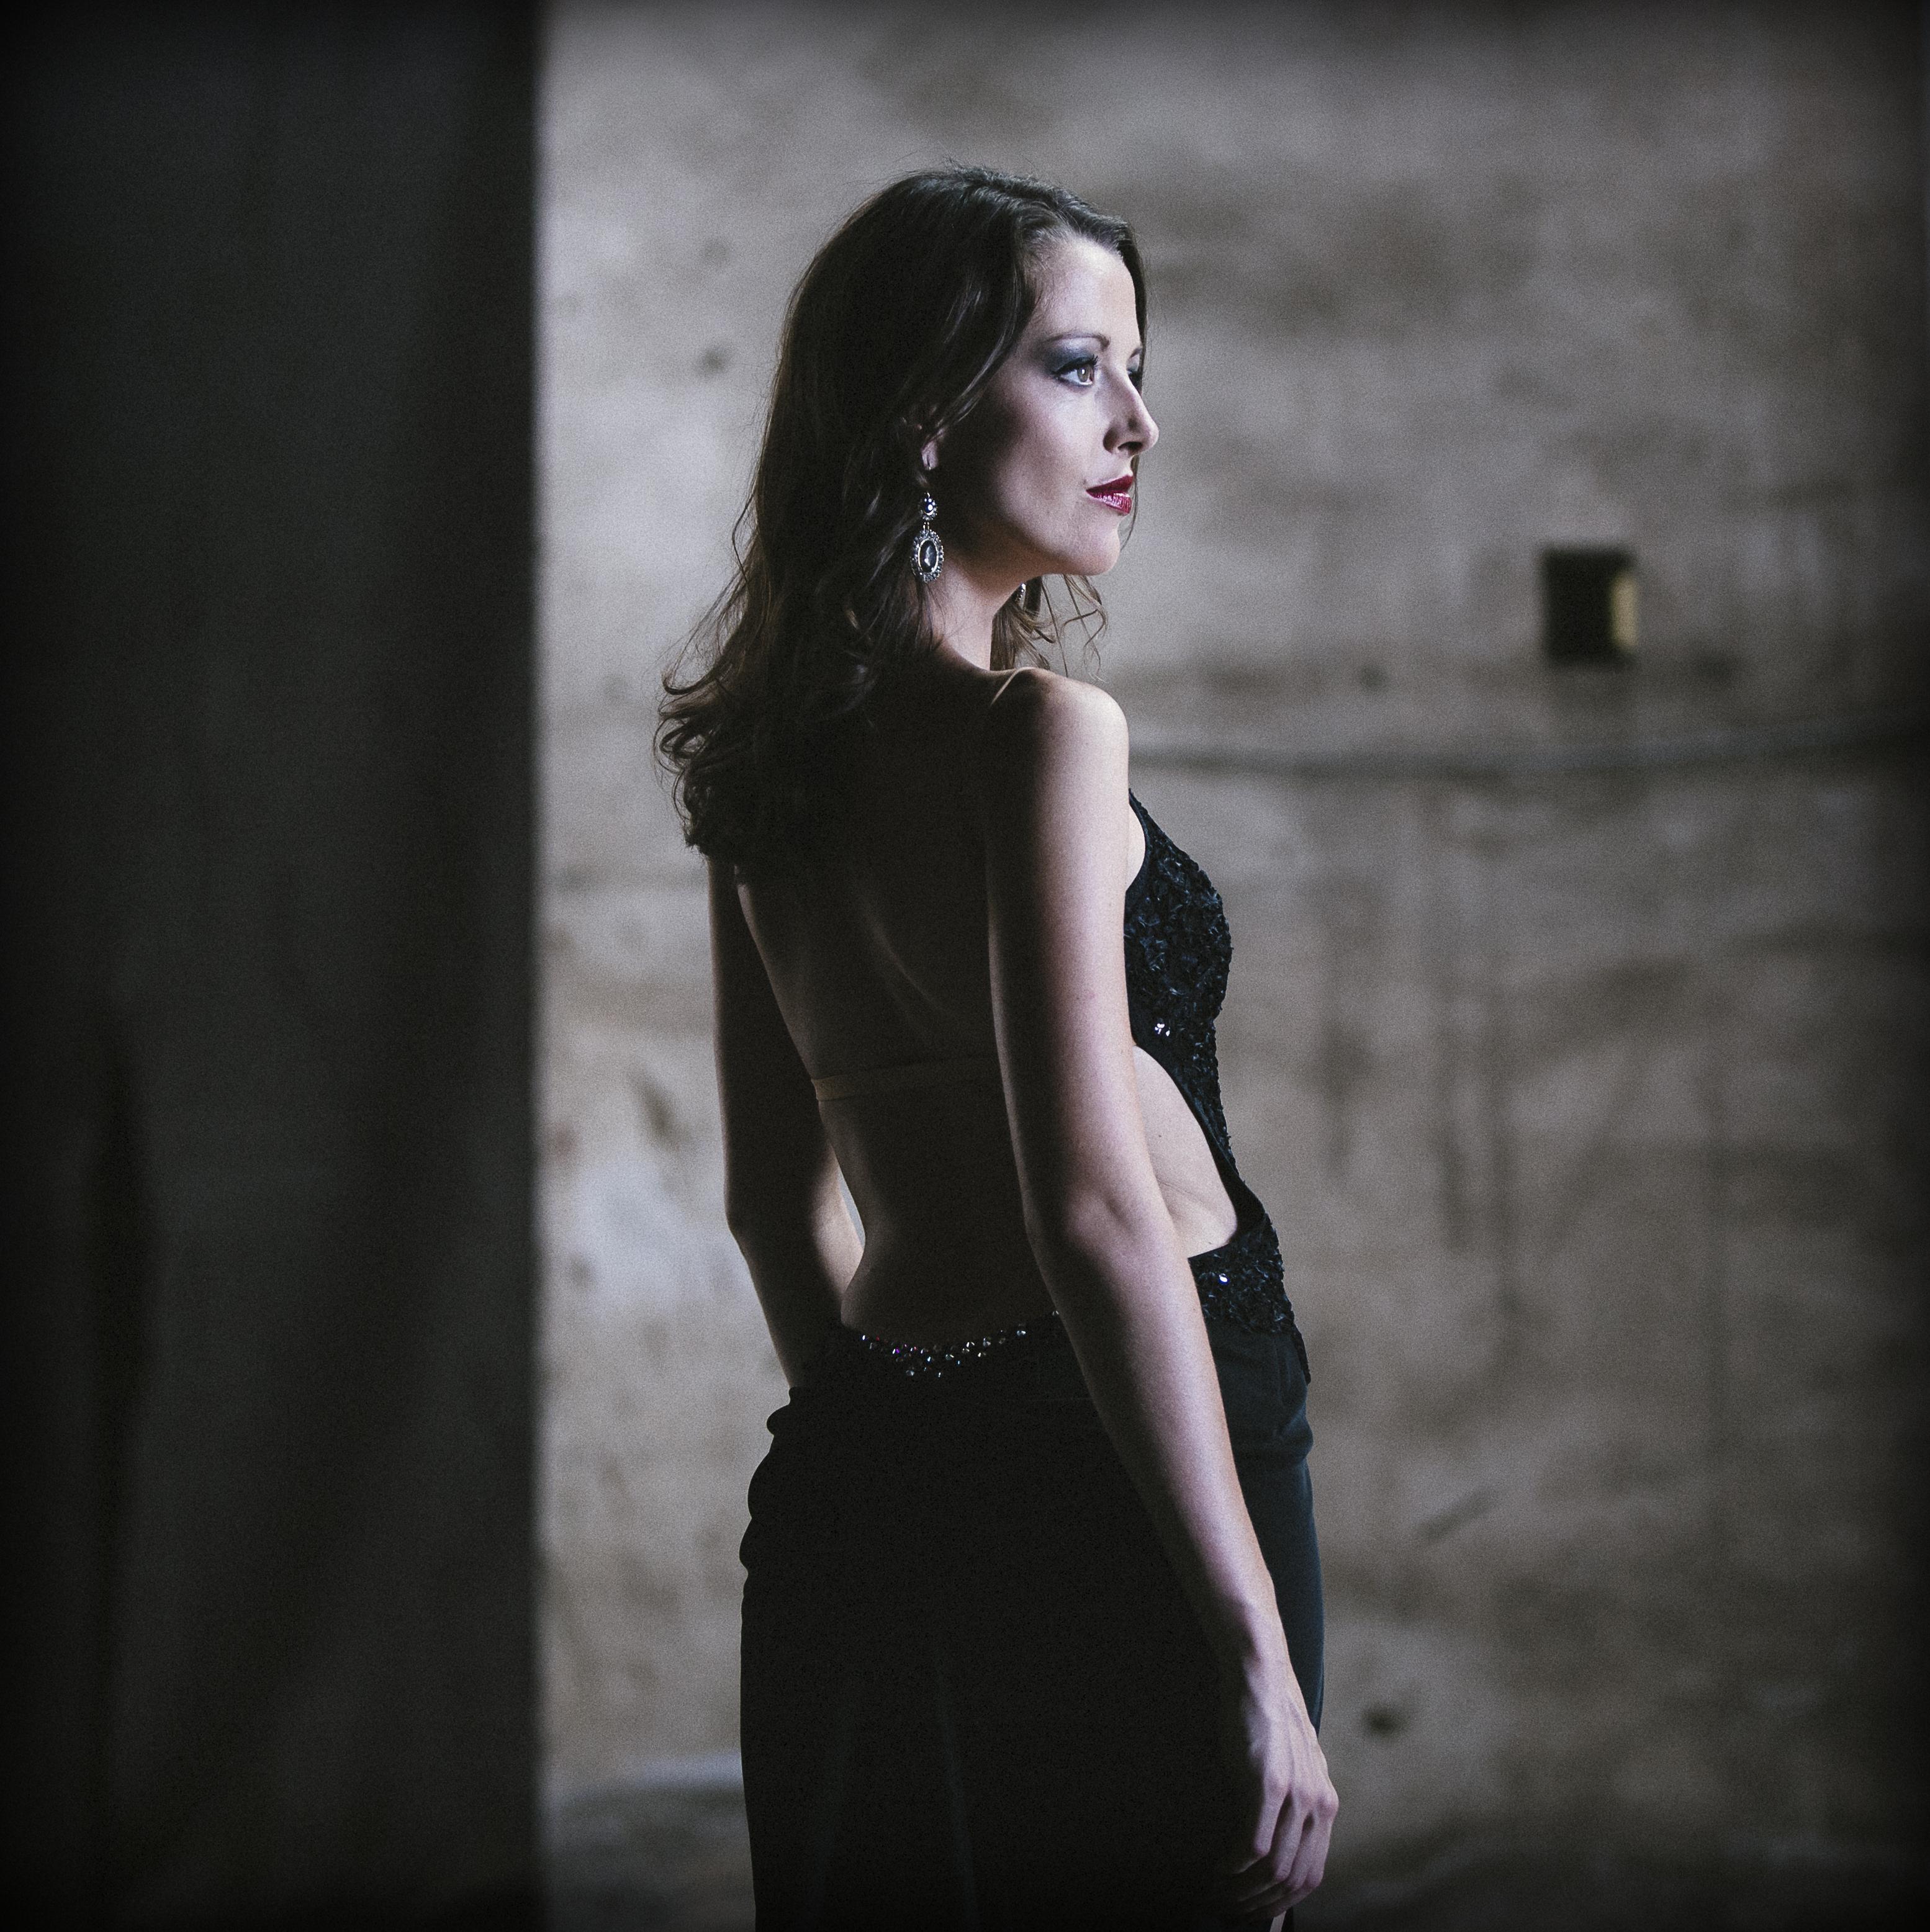 Thessa Hinteregger